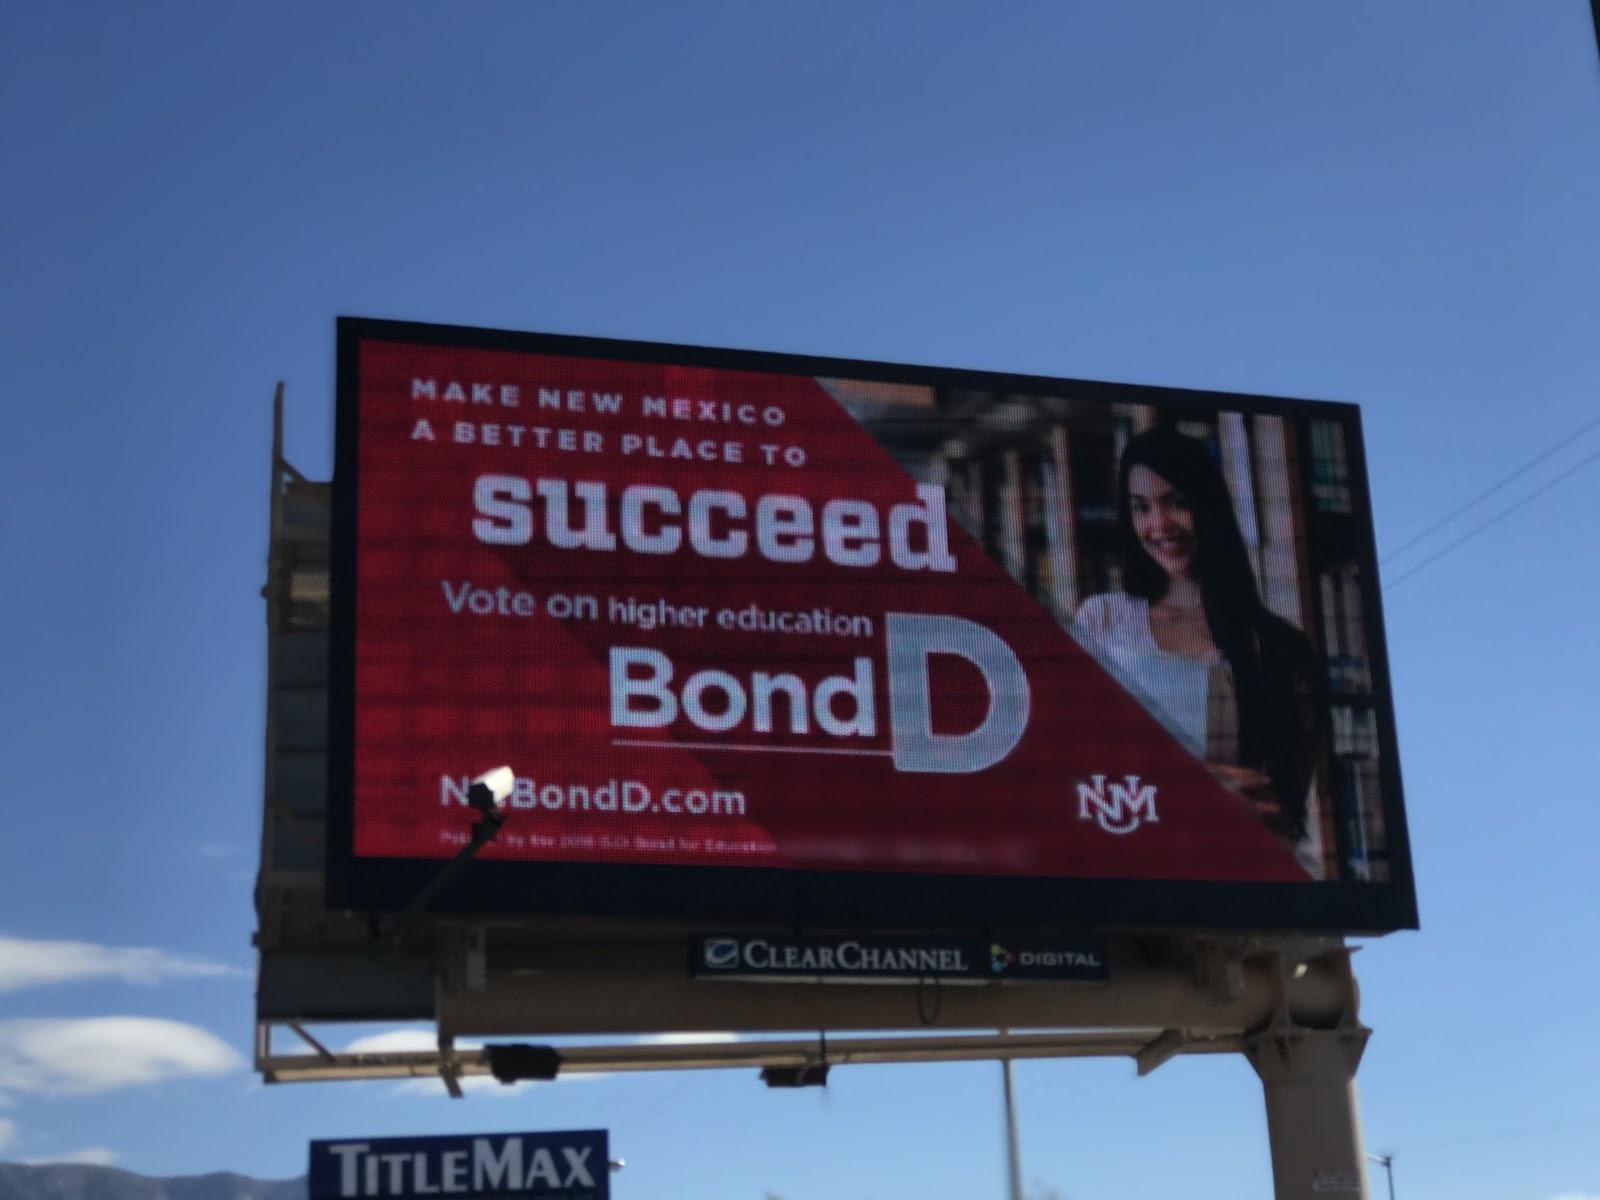 Bond D